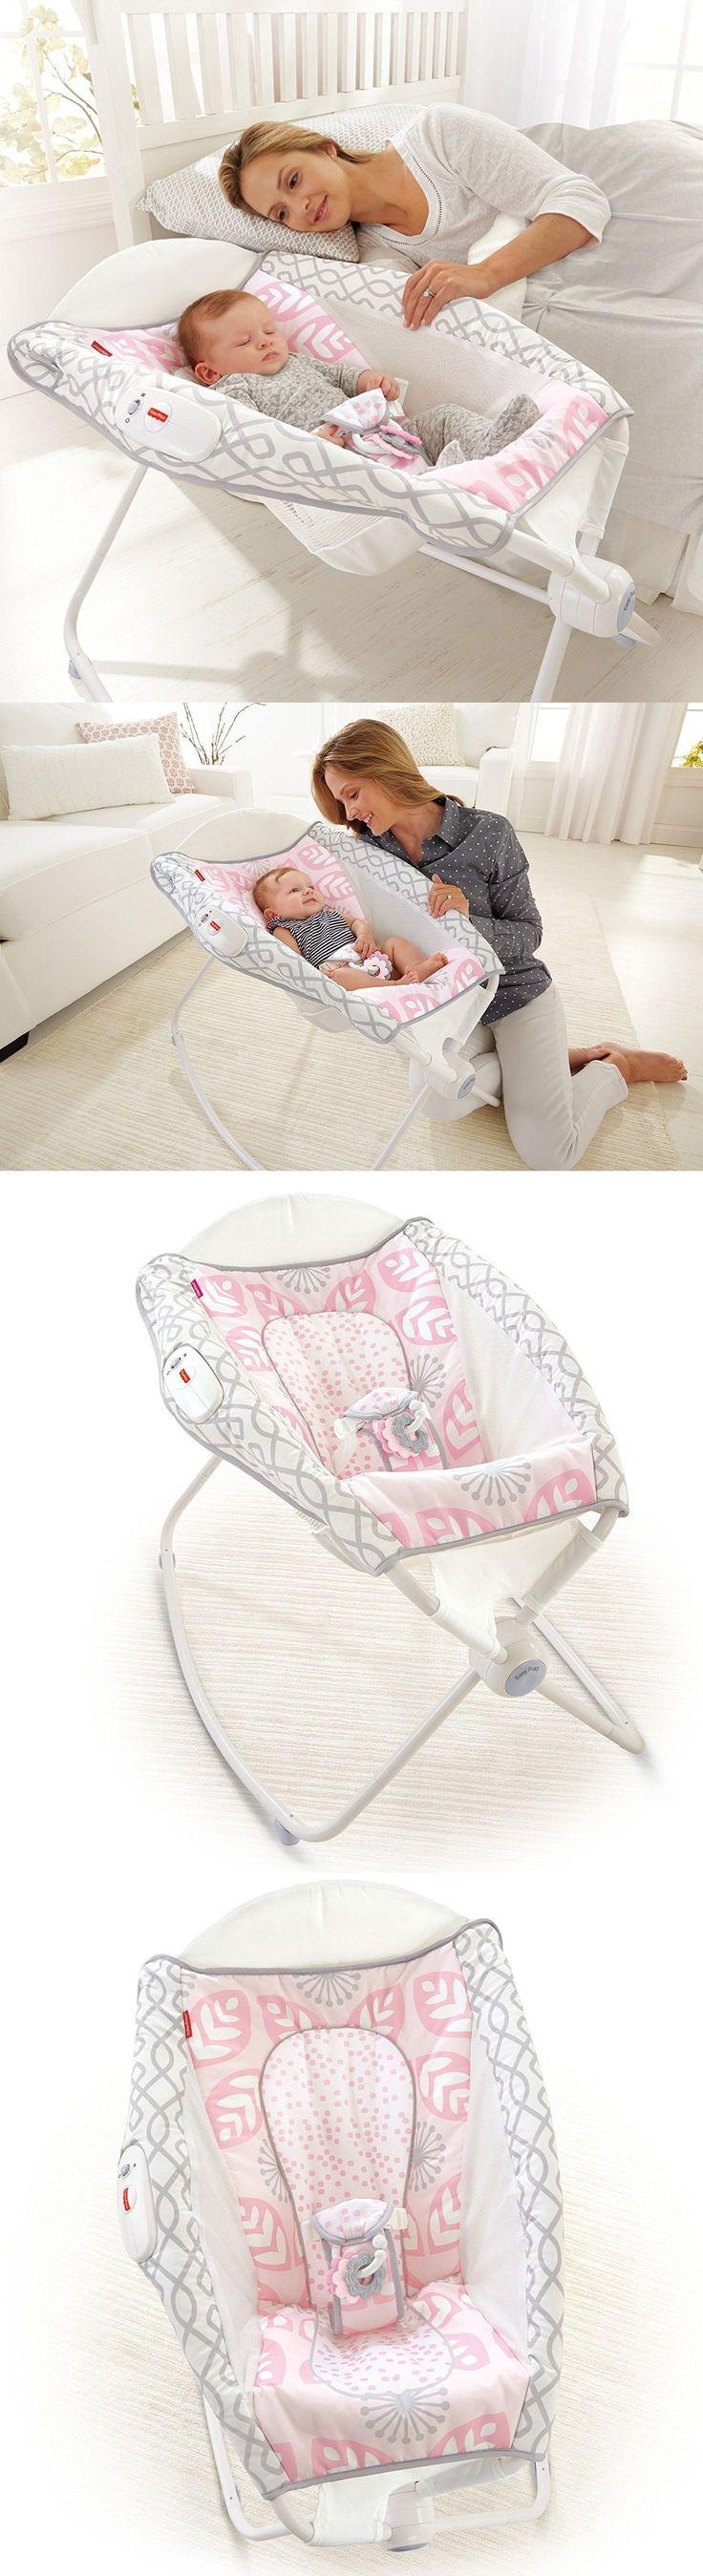 Baby: Rocking Baby Sleeper Toddler Rocker Newborn Cradle Infant Crib Bed Nursery Play -> BUY IT NOW ONLY: $68.29 on eBay!